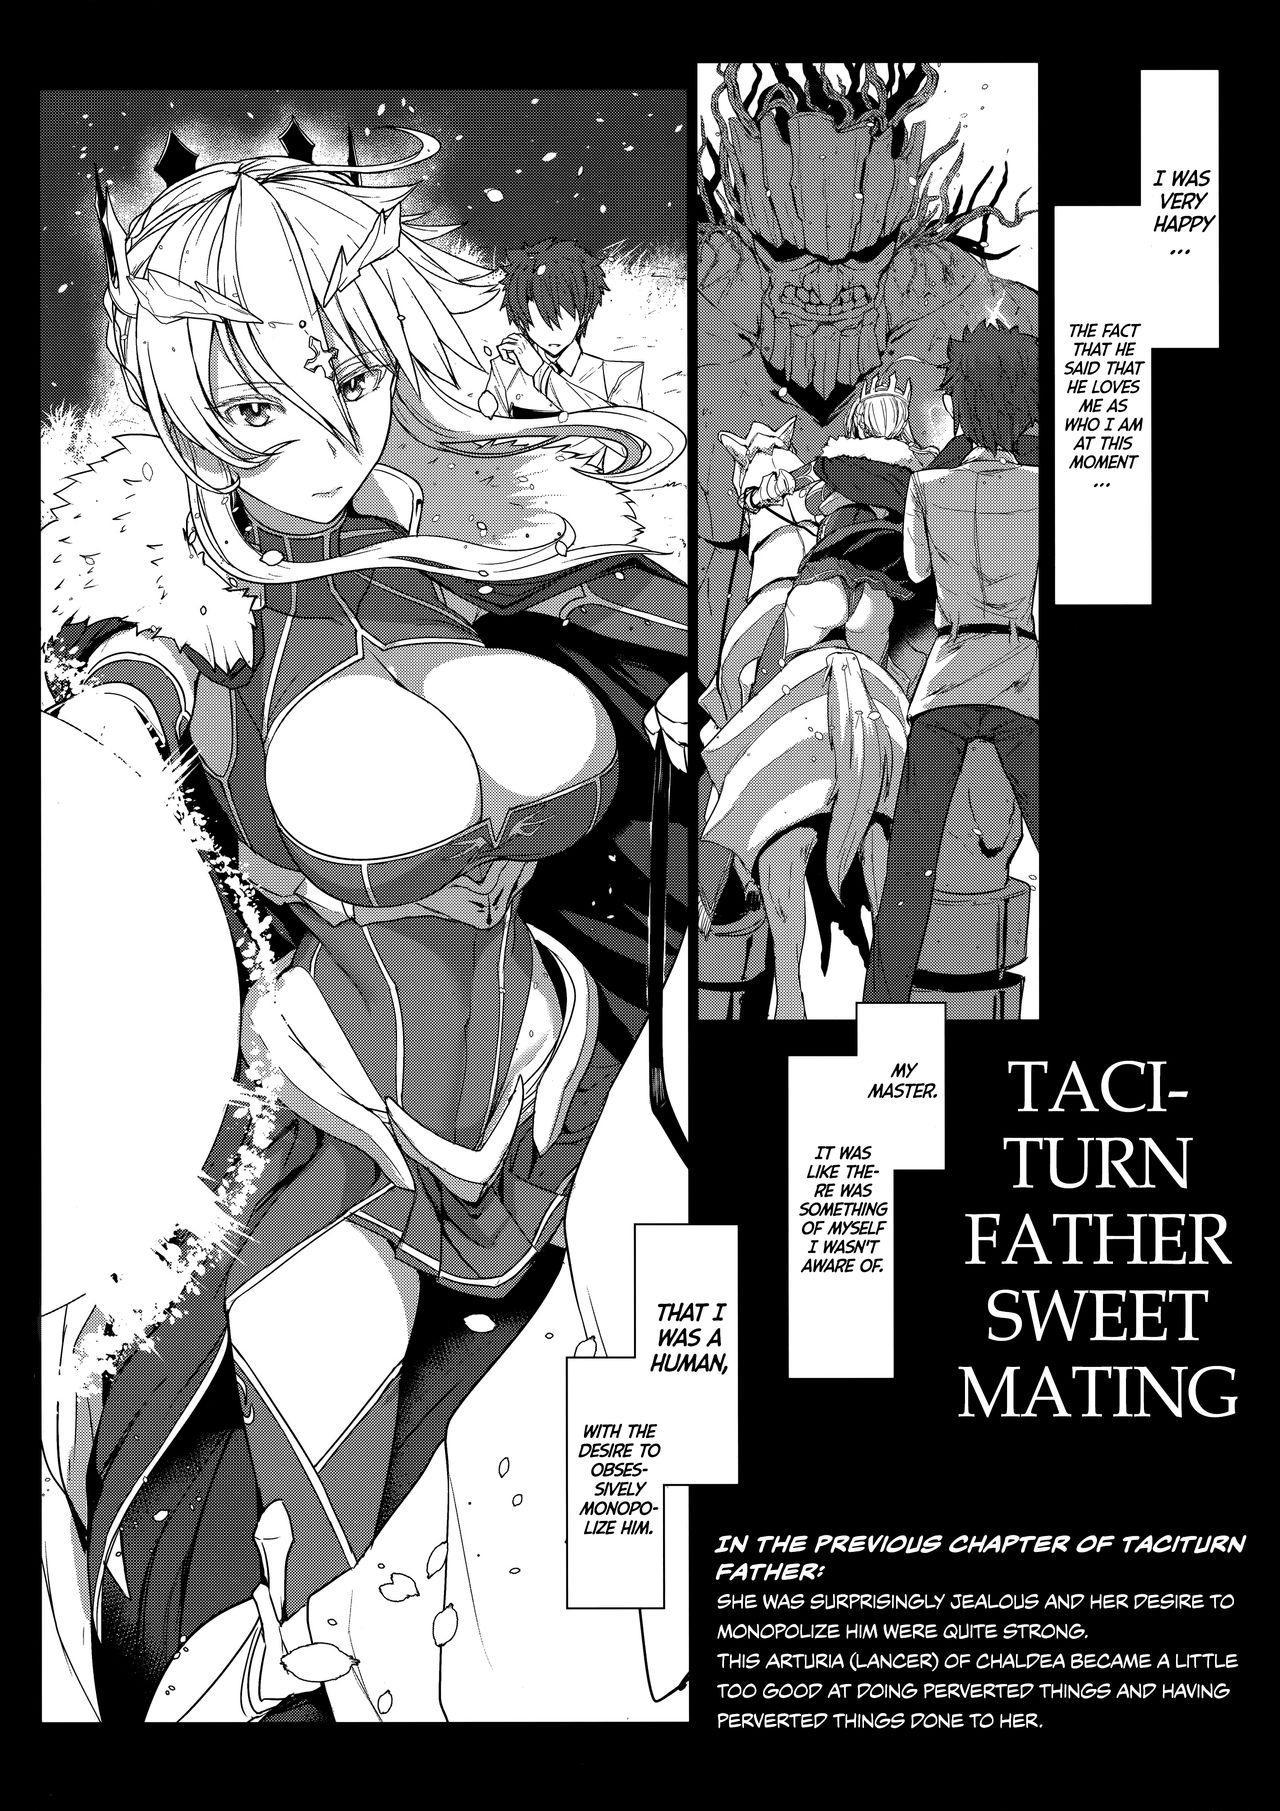 Muttsuri Chichiue Amaama Koubi   Taciturn Father Sweet Mating 2